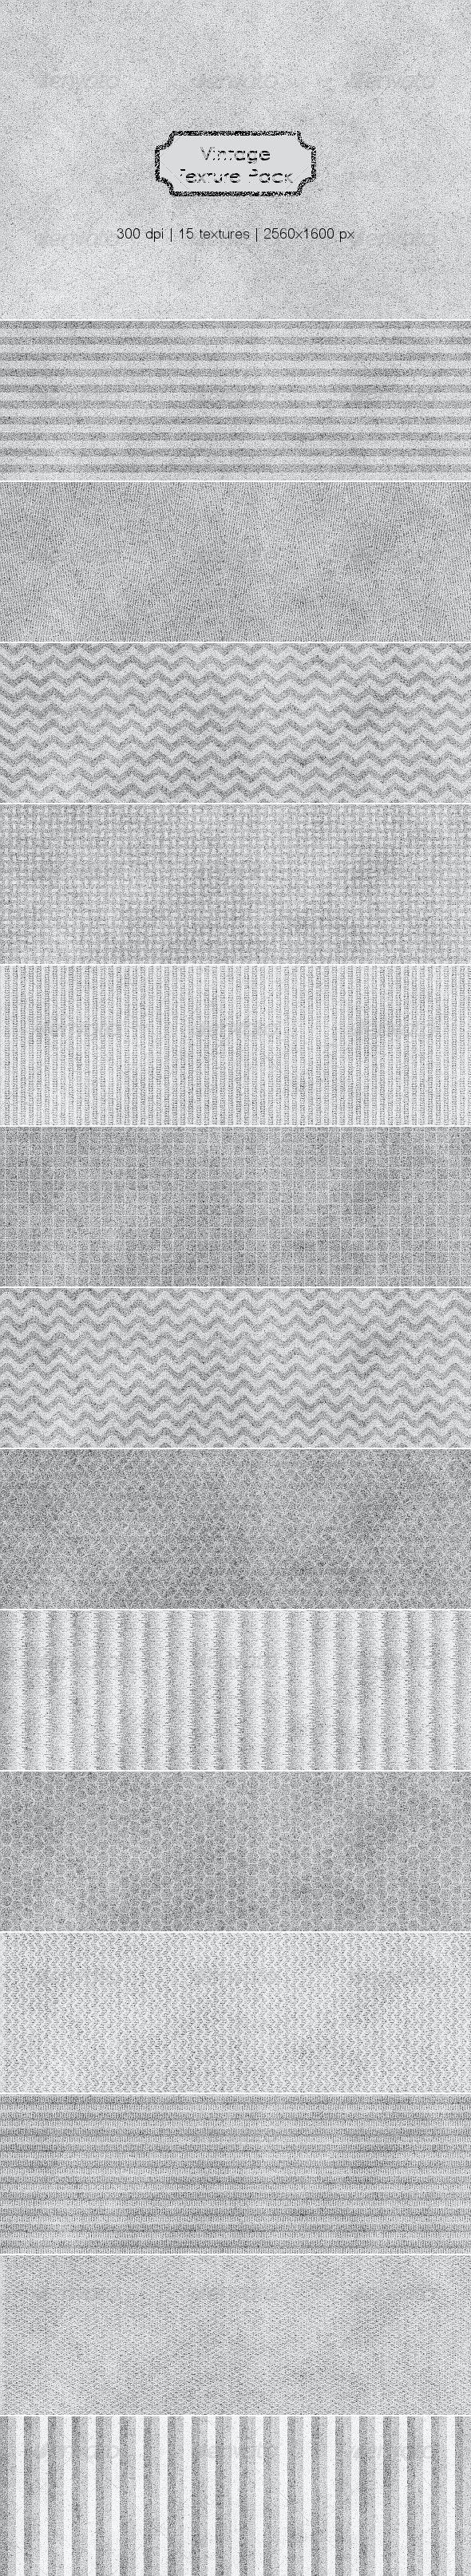 Vintage Paper Textures Pack - Paper Textures